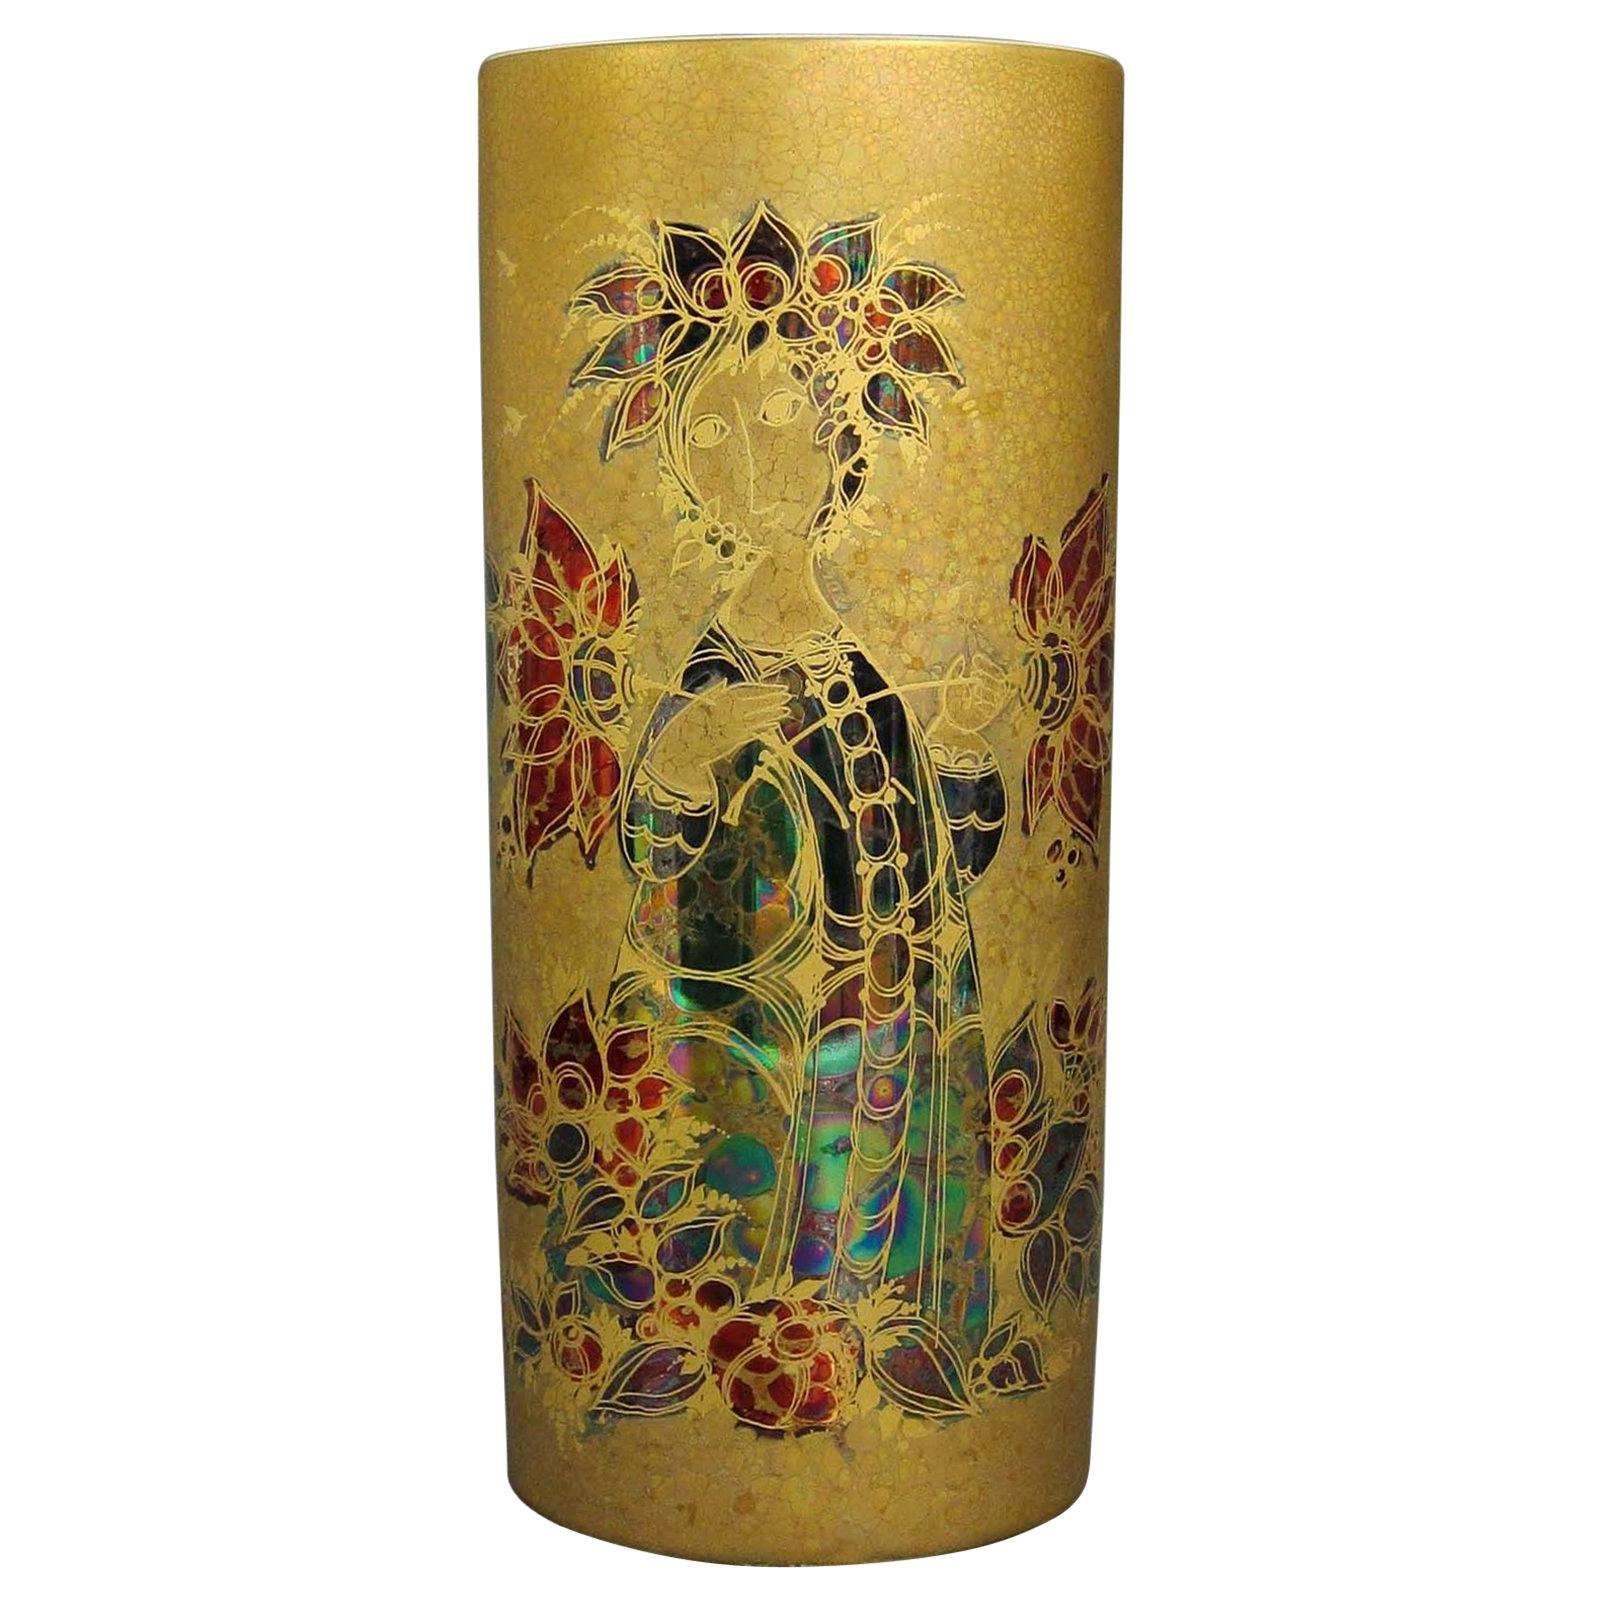 Rare Rosenthal Studio Hand Painted Gilded Vase by Bjorn Wiinblad, 1960s